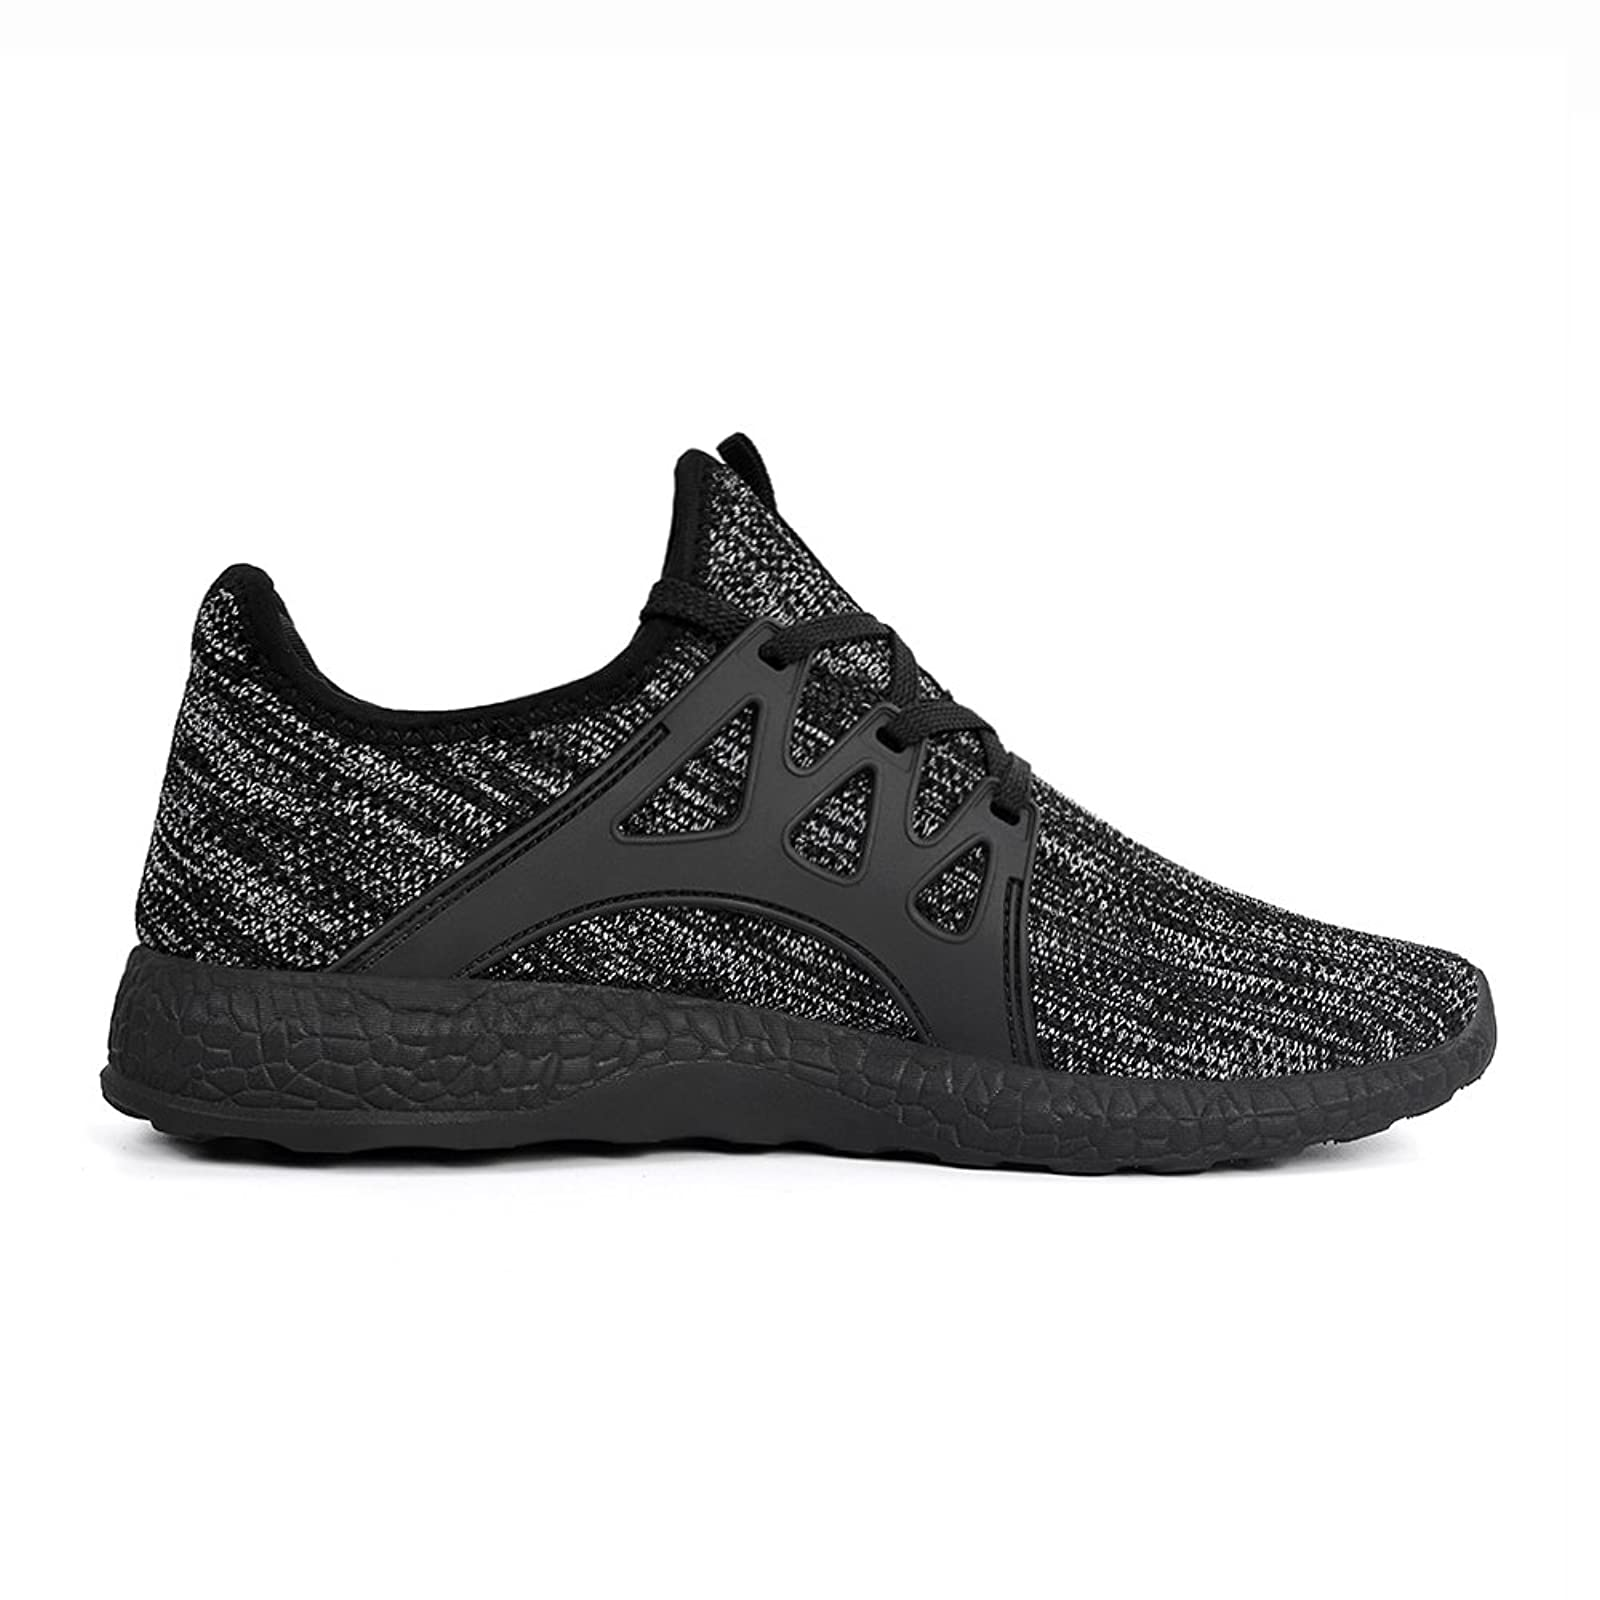 Feetmat Womens Sneakers Ultra Lightweight Breathable Mesh - 1